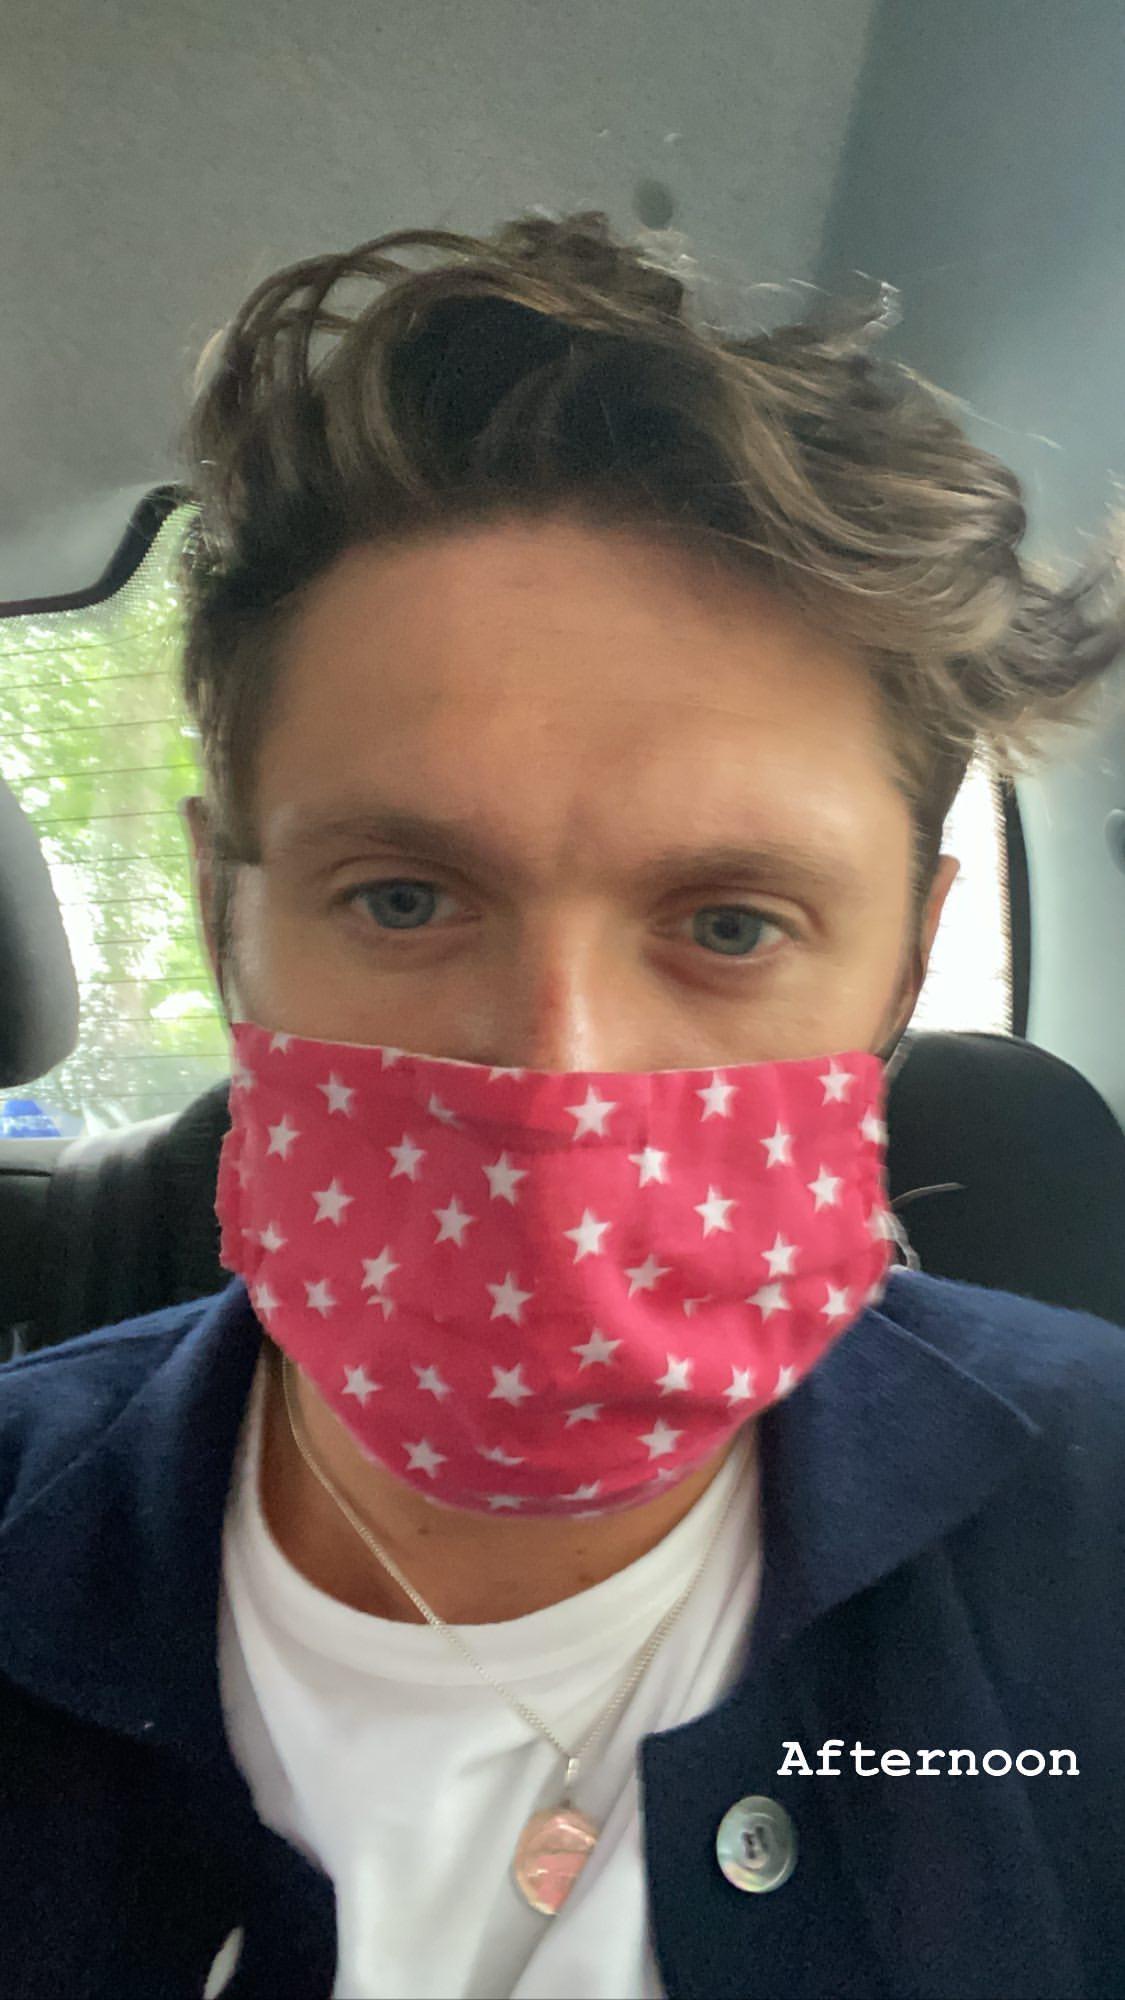 General photo of Niall Horan